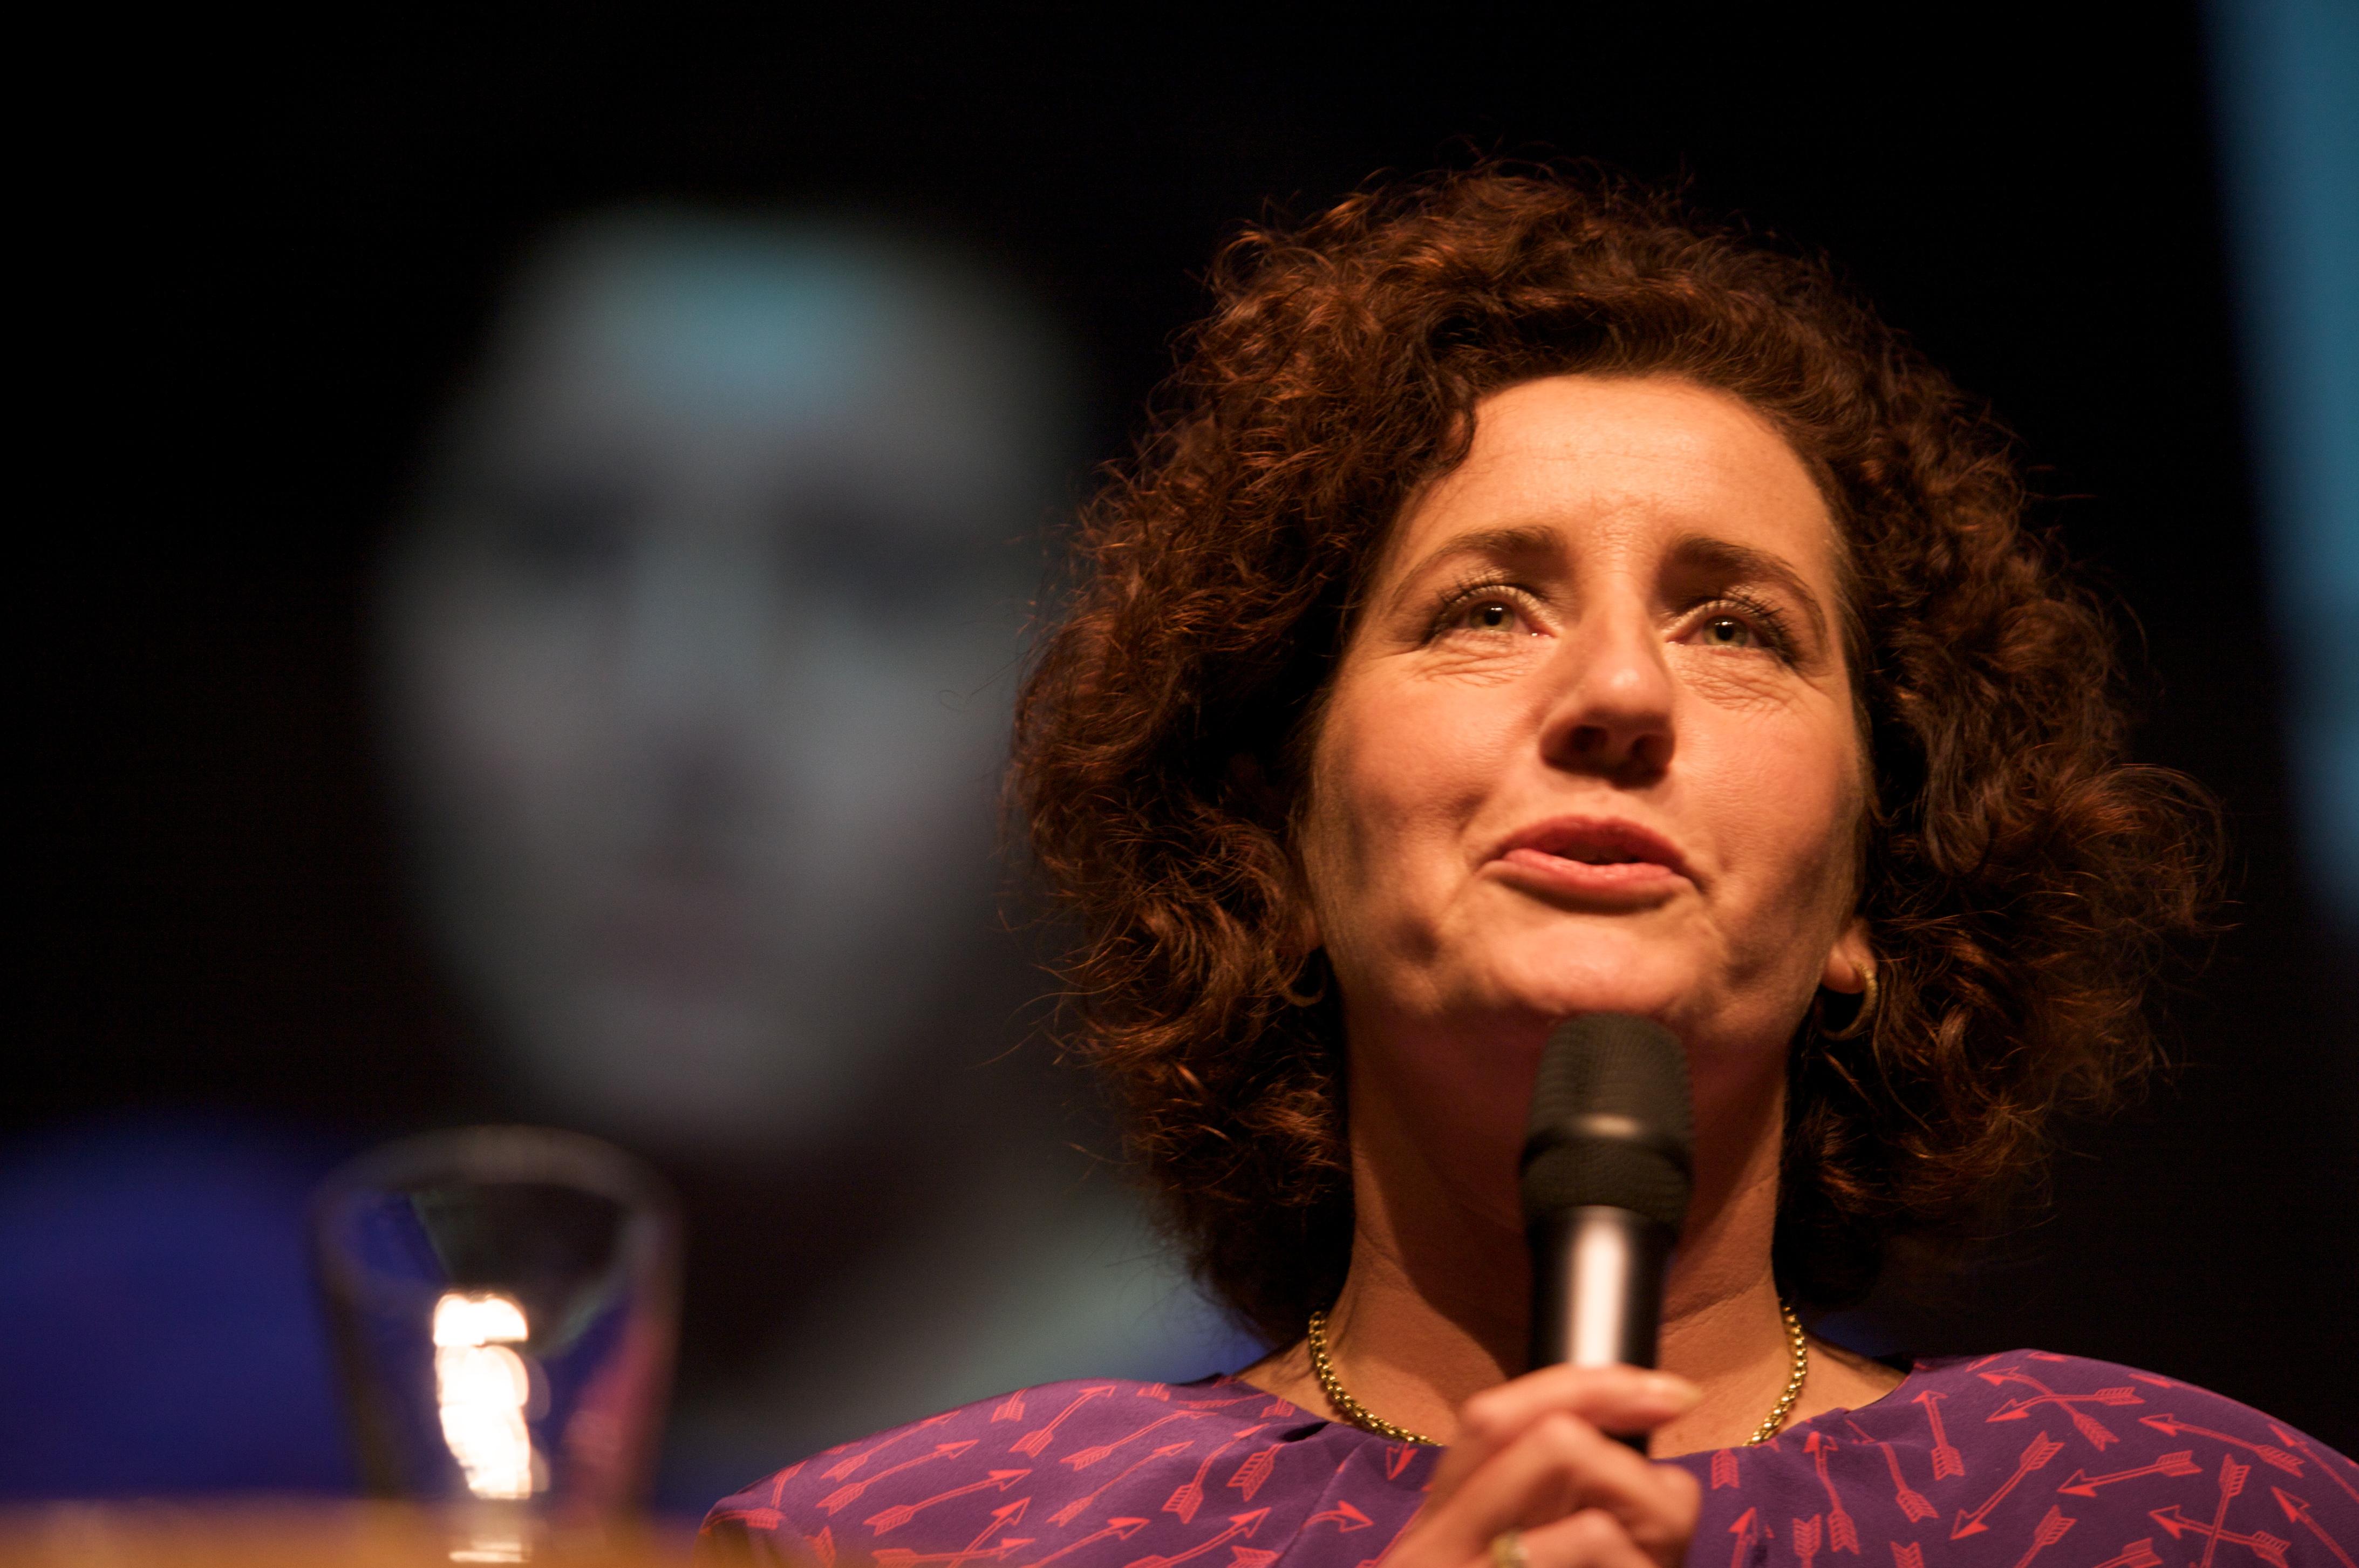 Demissionair minister Ingrid van Engelshoven